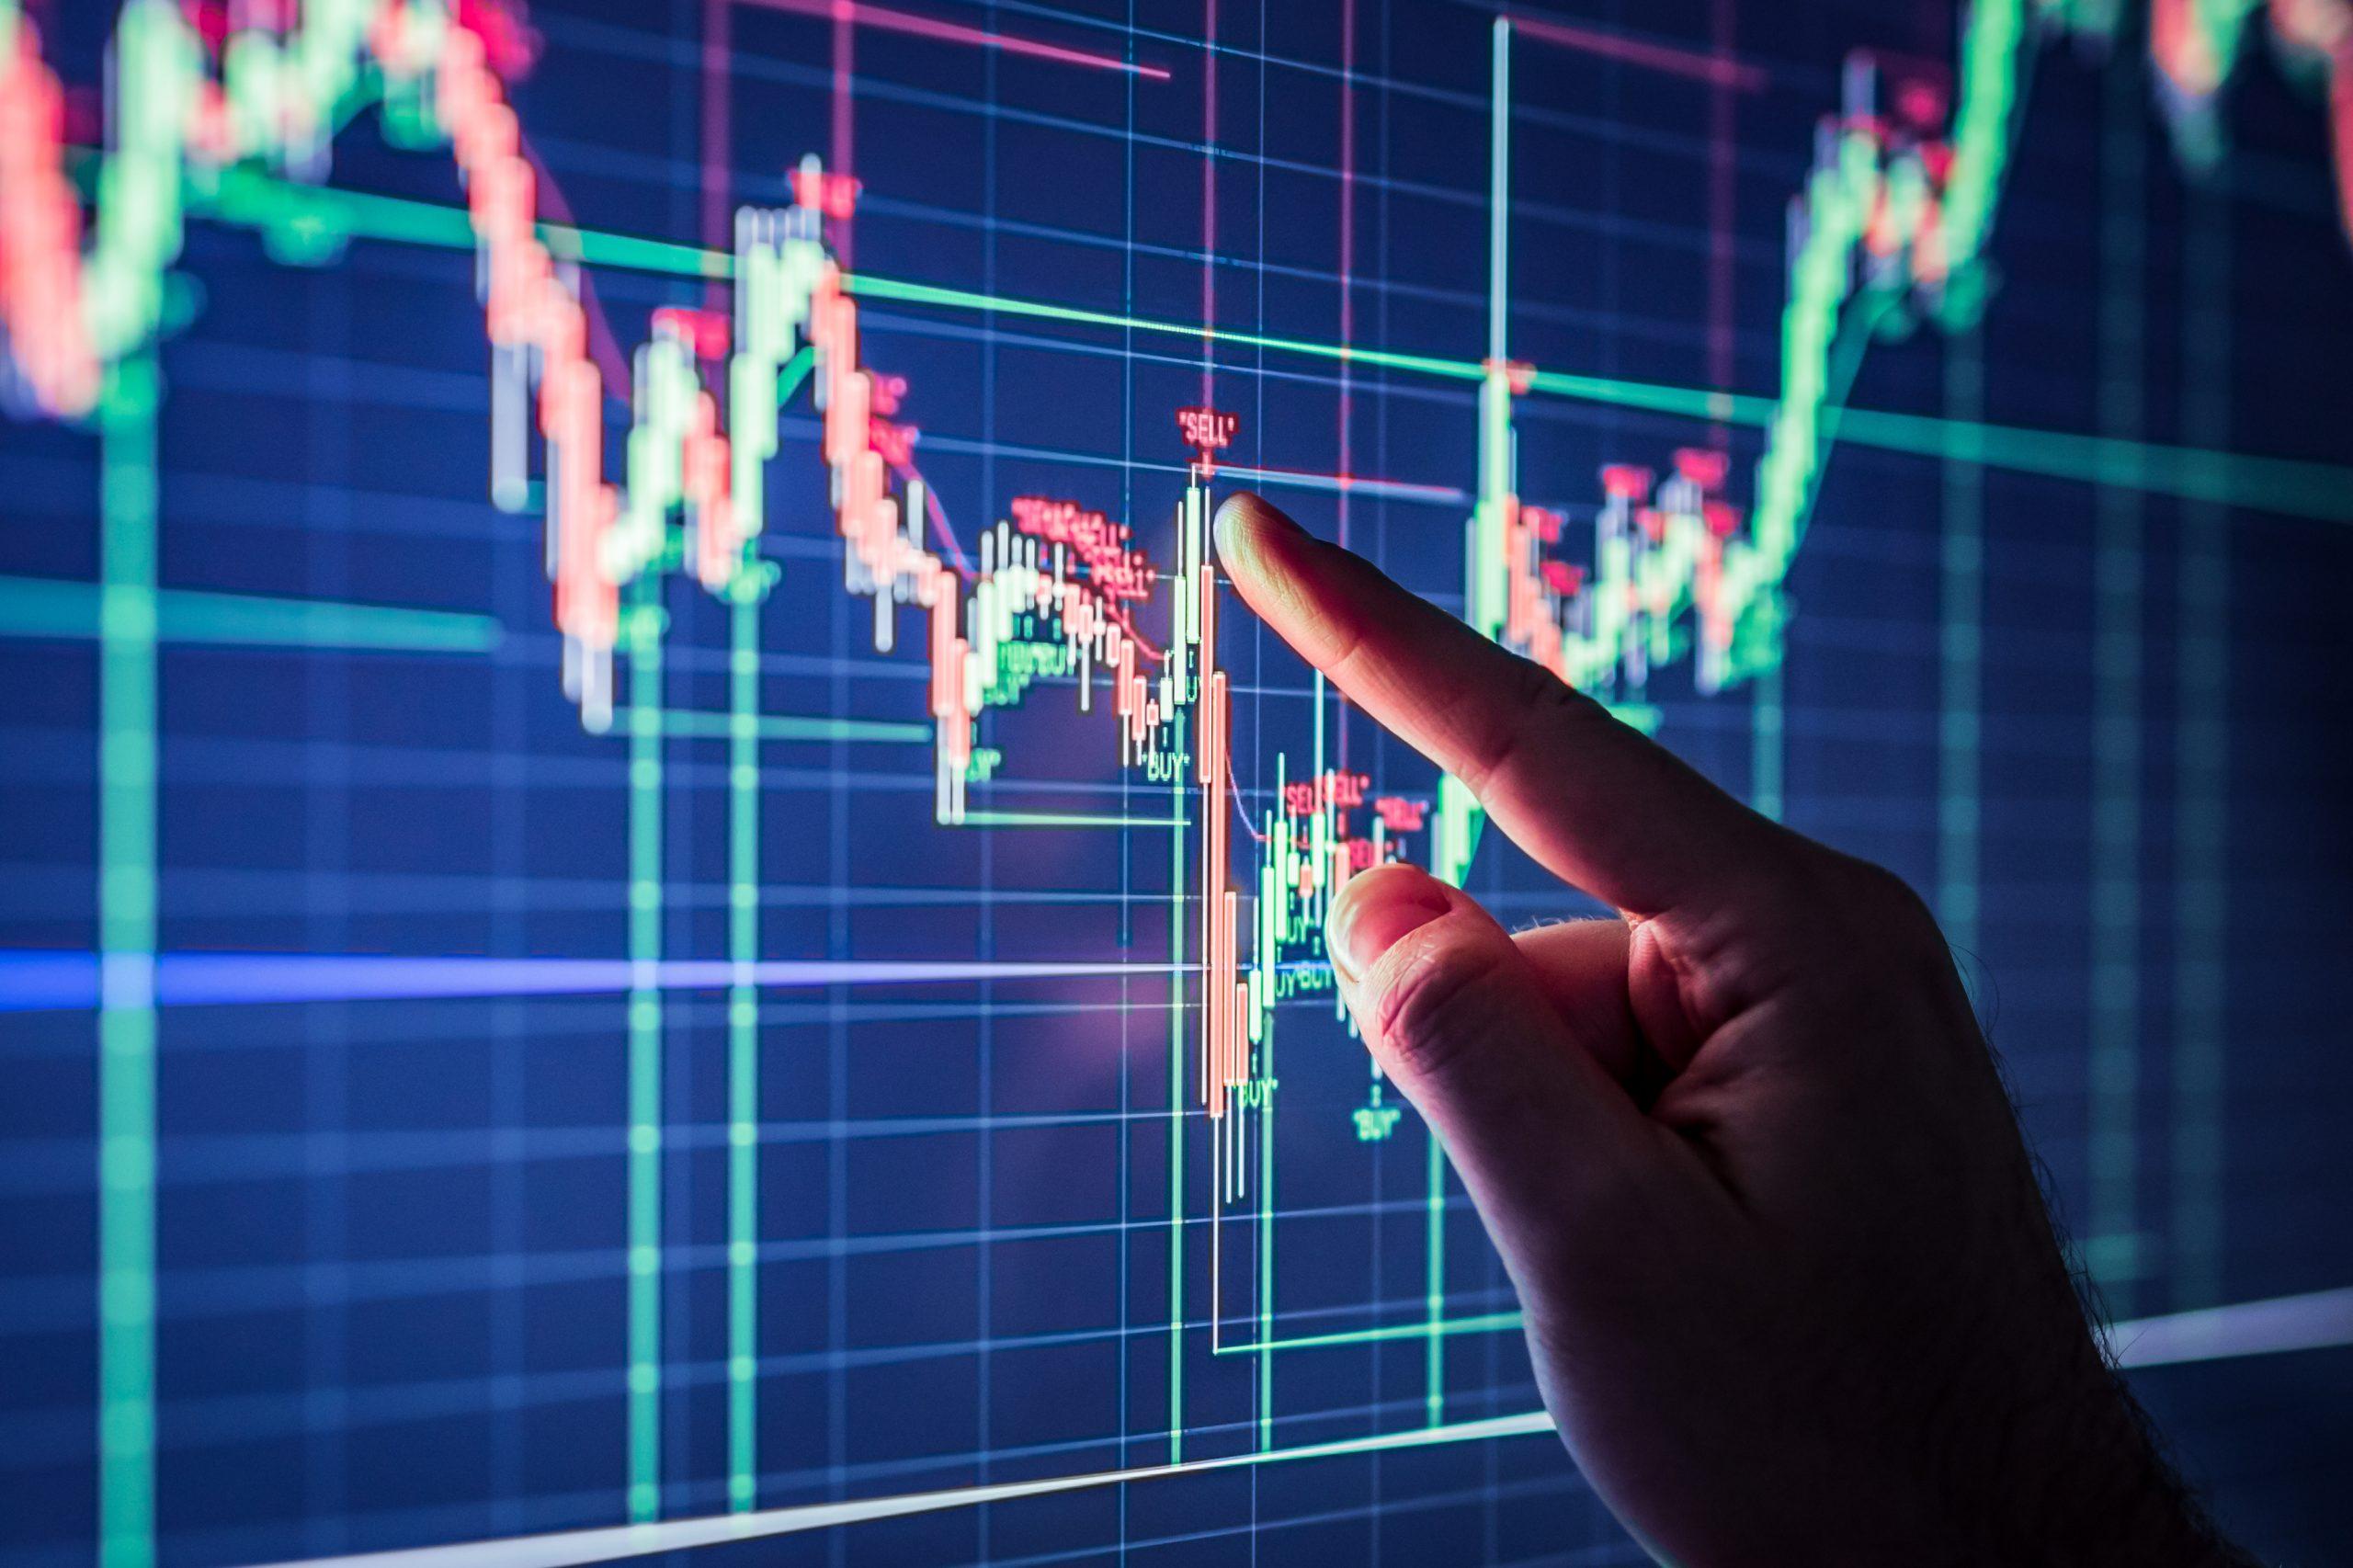 Latest Stock Market News: Elon, Wall Street saga